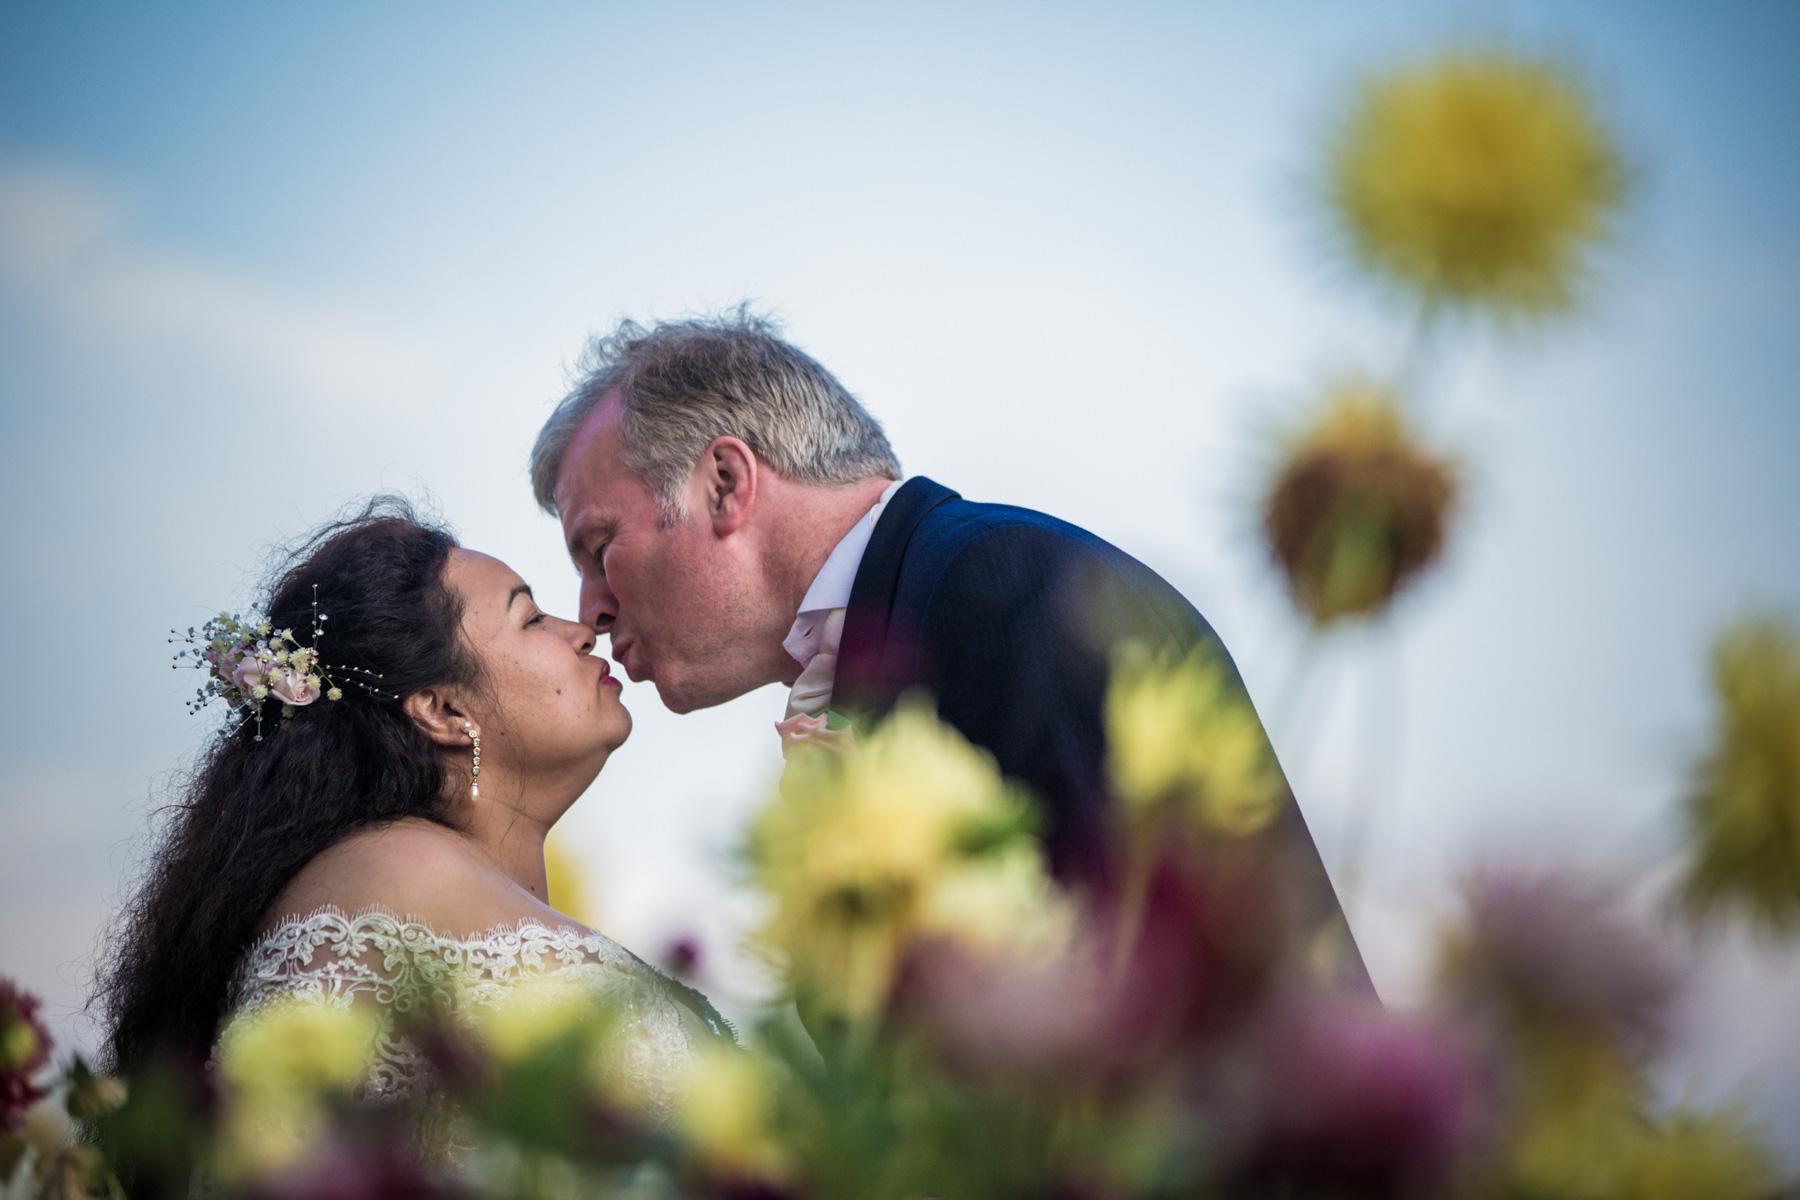 Sussex Wedding Photographer Richard Murgatroyd Photography